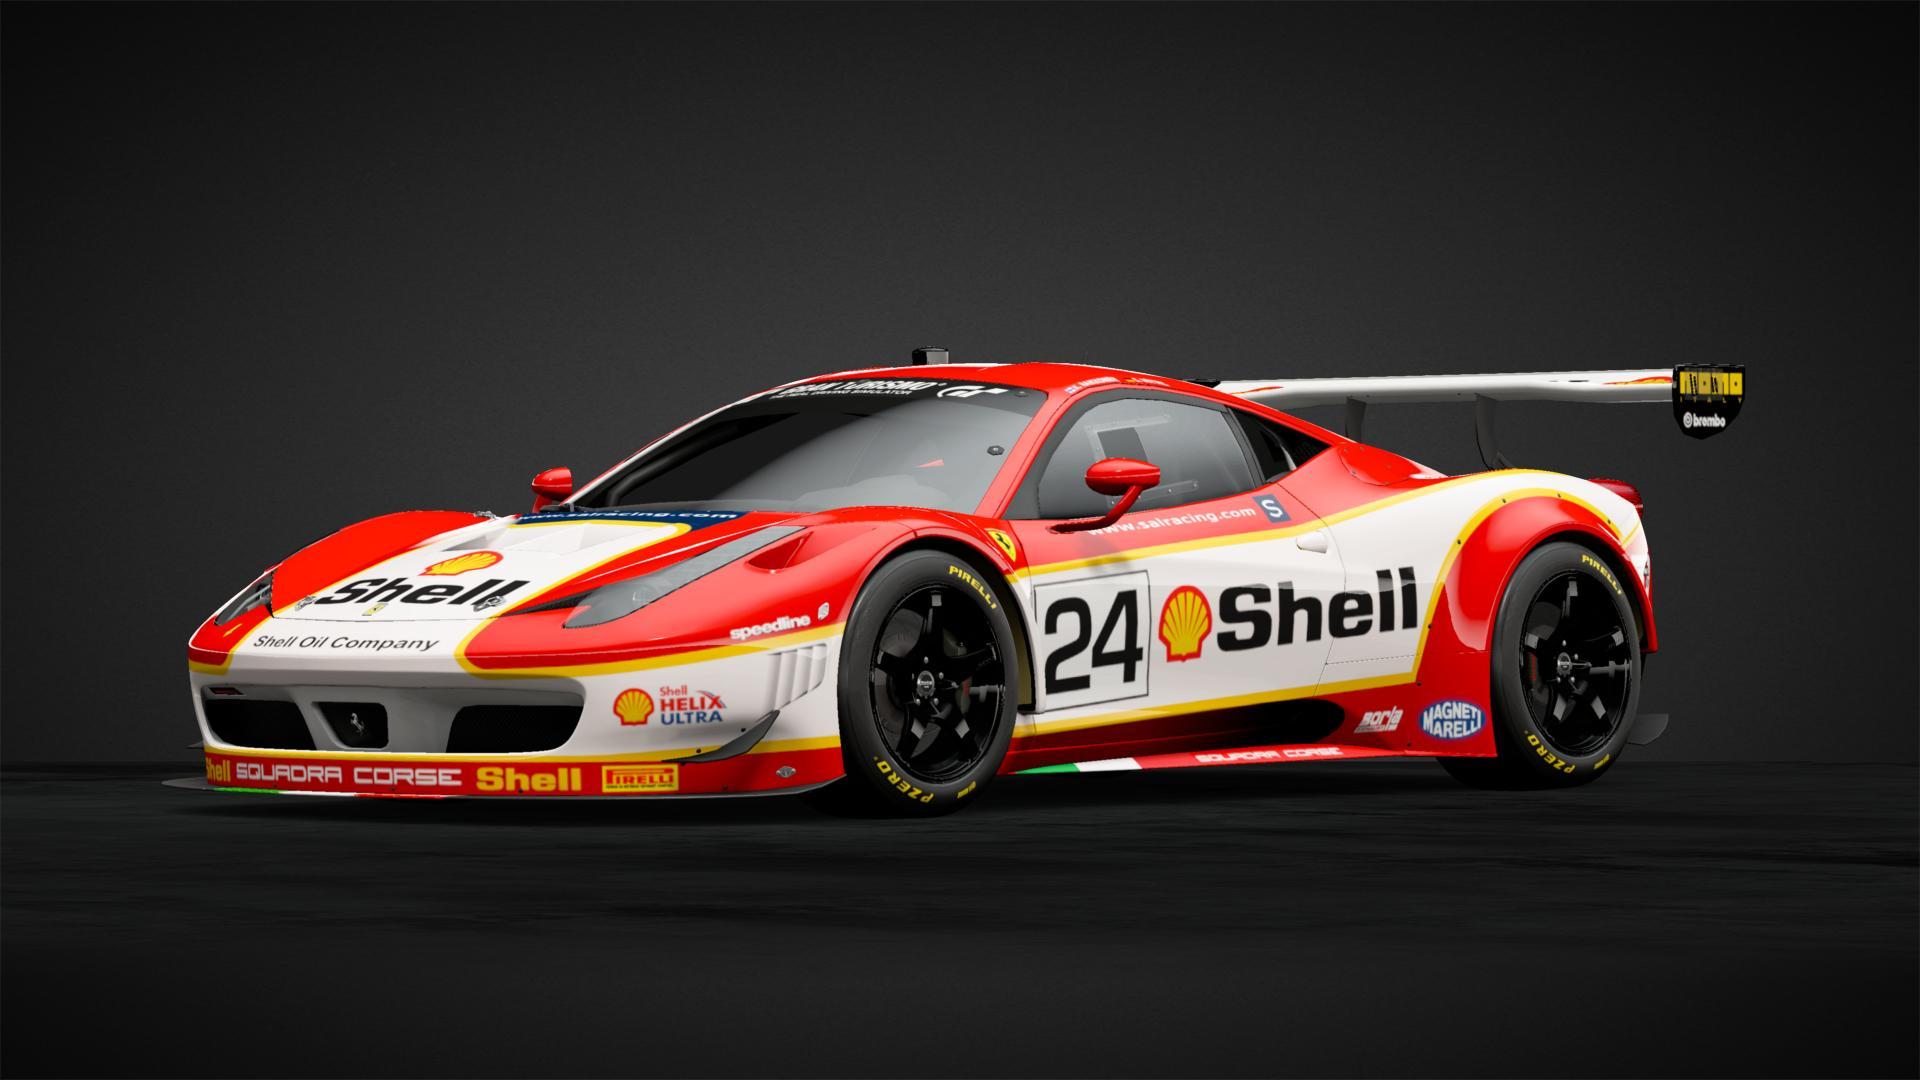 Shell Ferrari 458 Italia Gt3 Car Livery By Tahoeracing Community Gran Turismo Sport